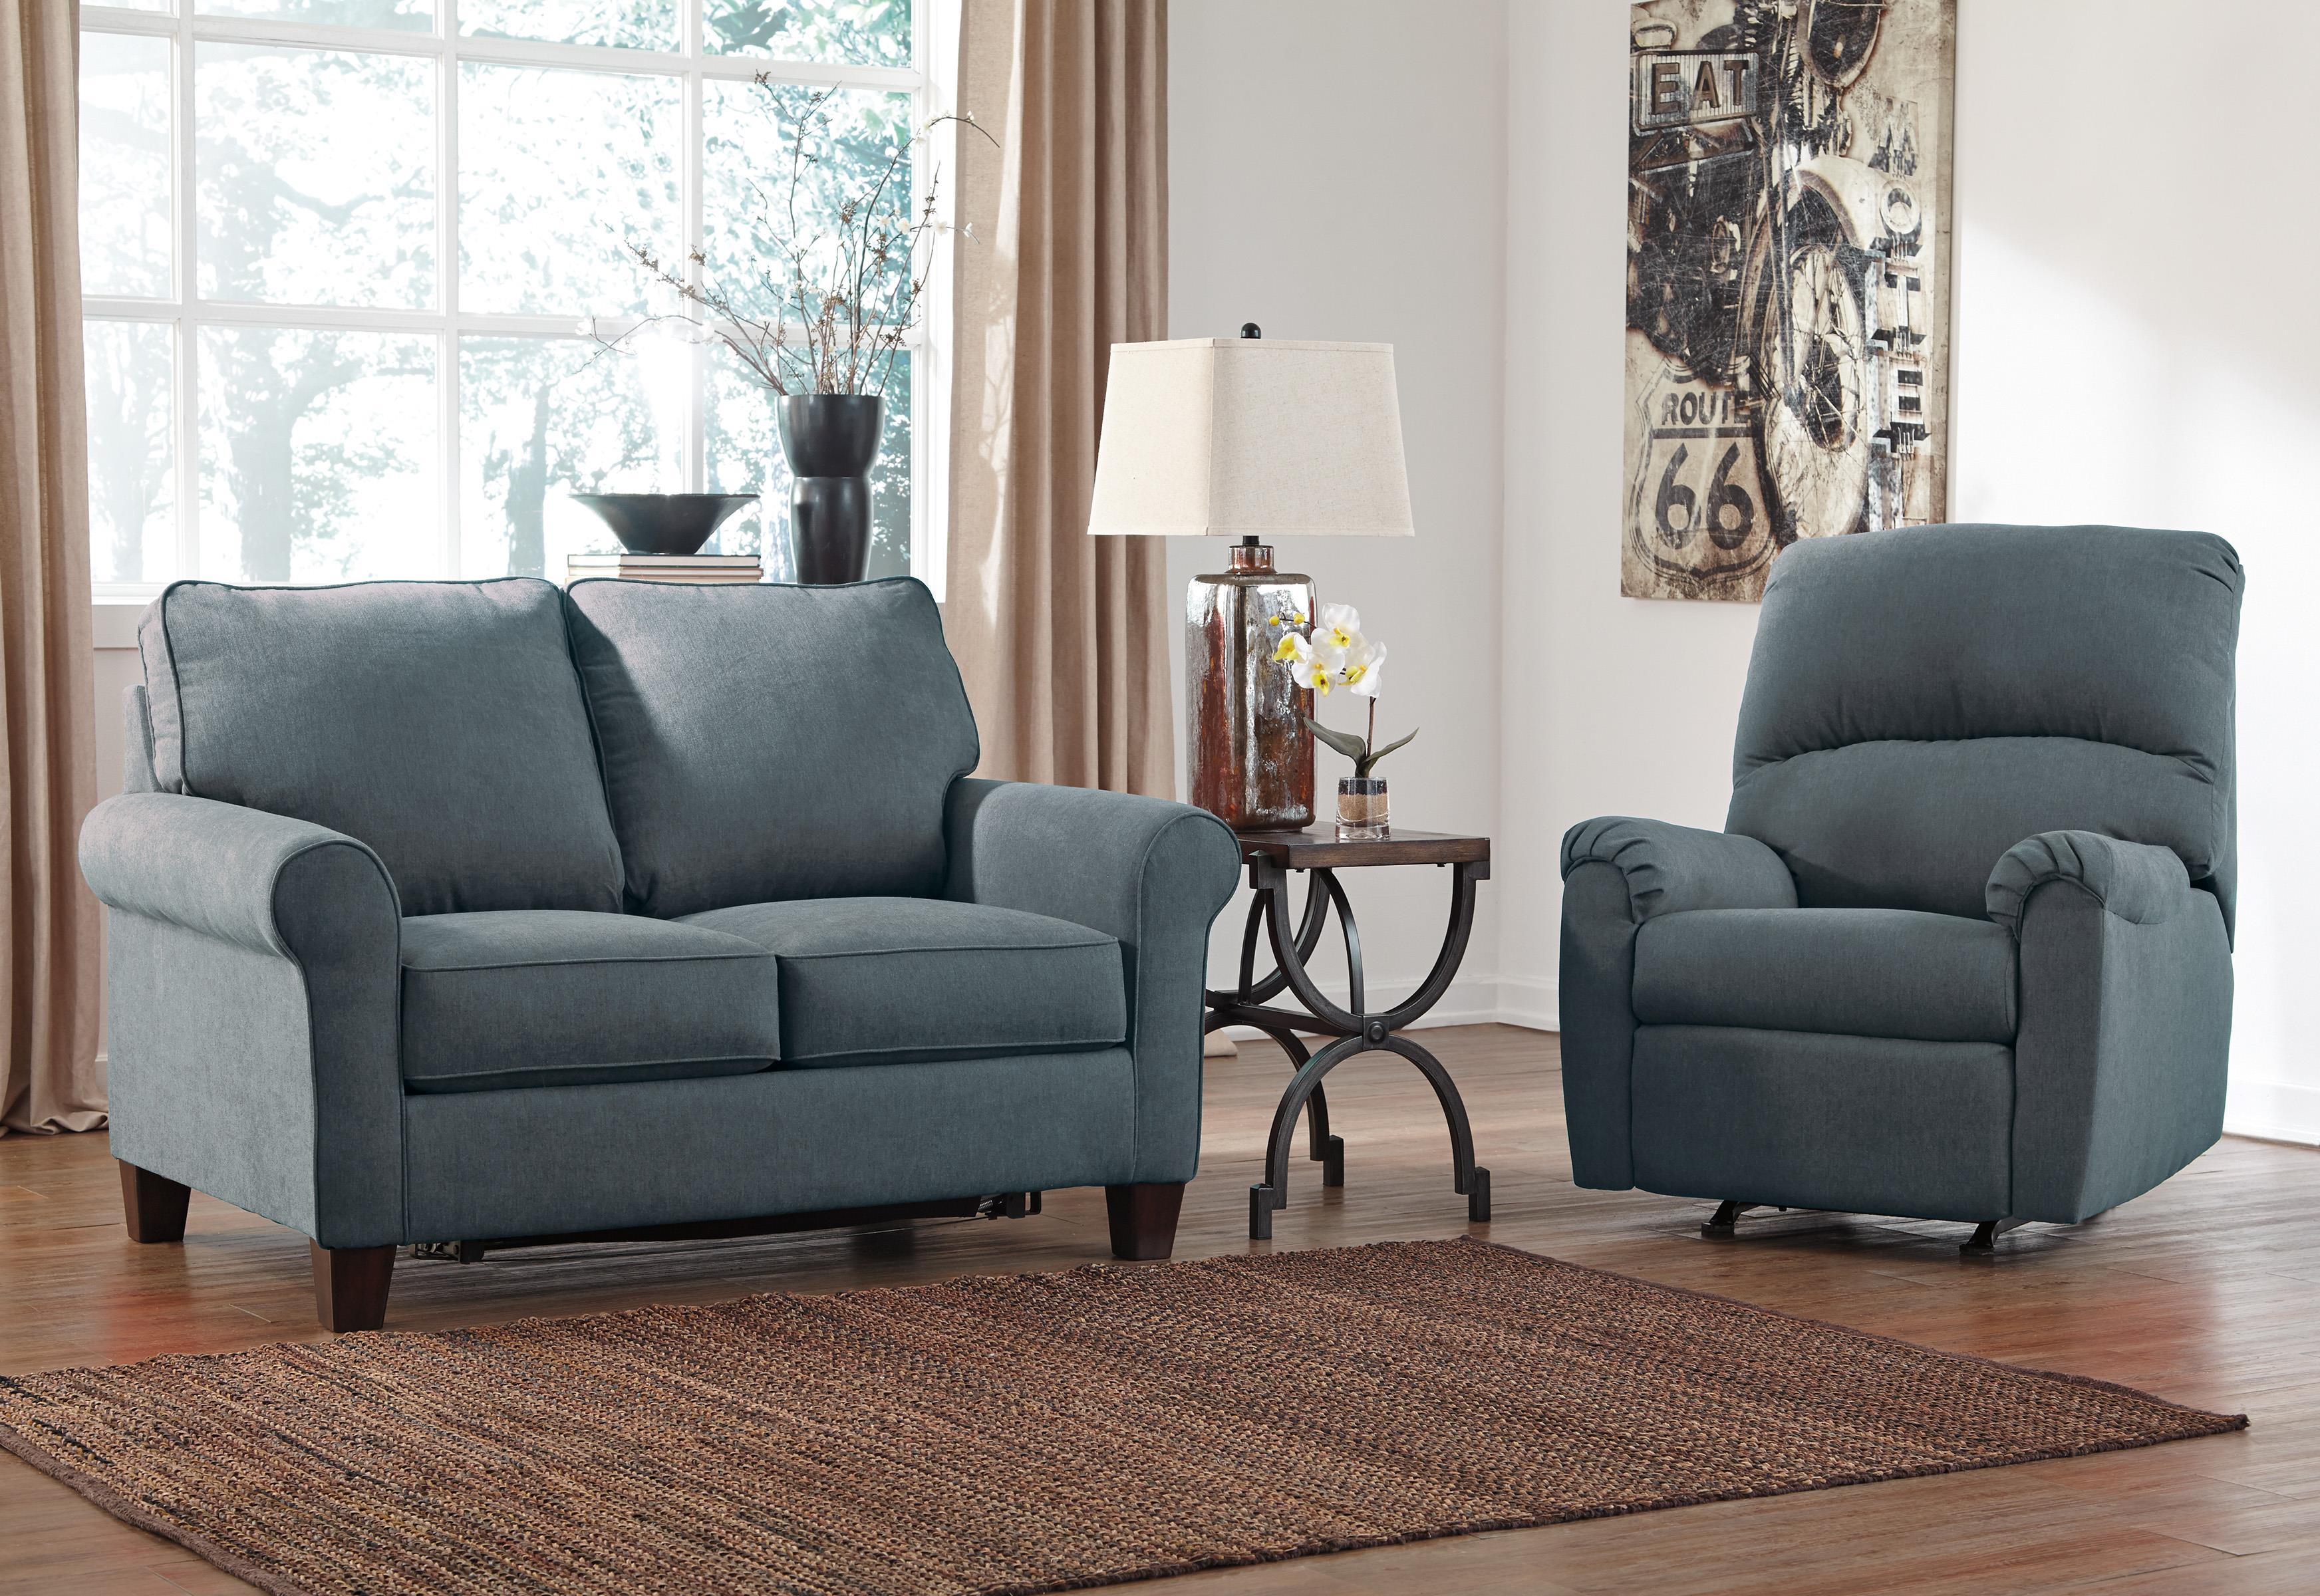 Signature Design By Ashley Zeth Denim 82 Queen Sofa Sleeper Wayside Furniture Sofa Sleeper